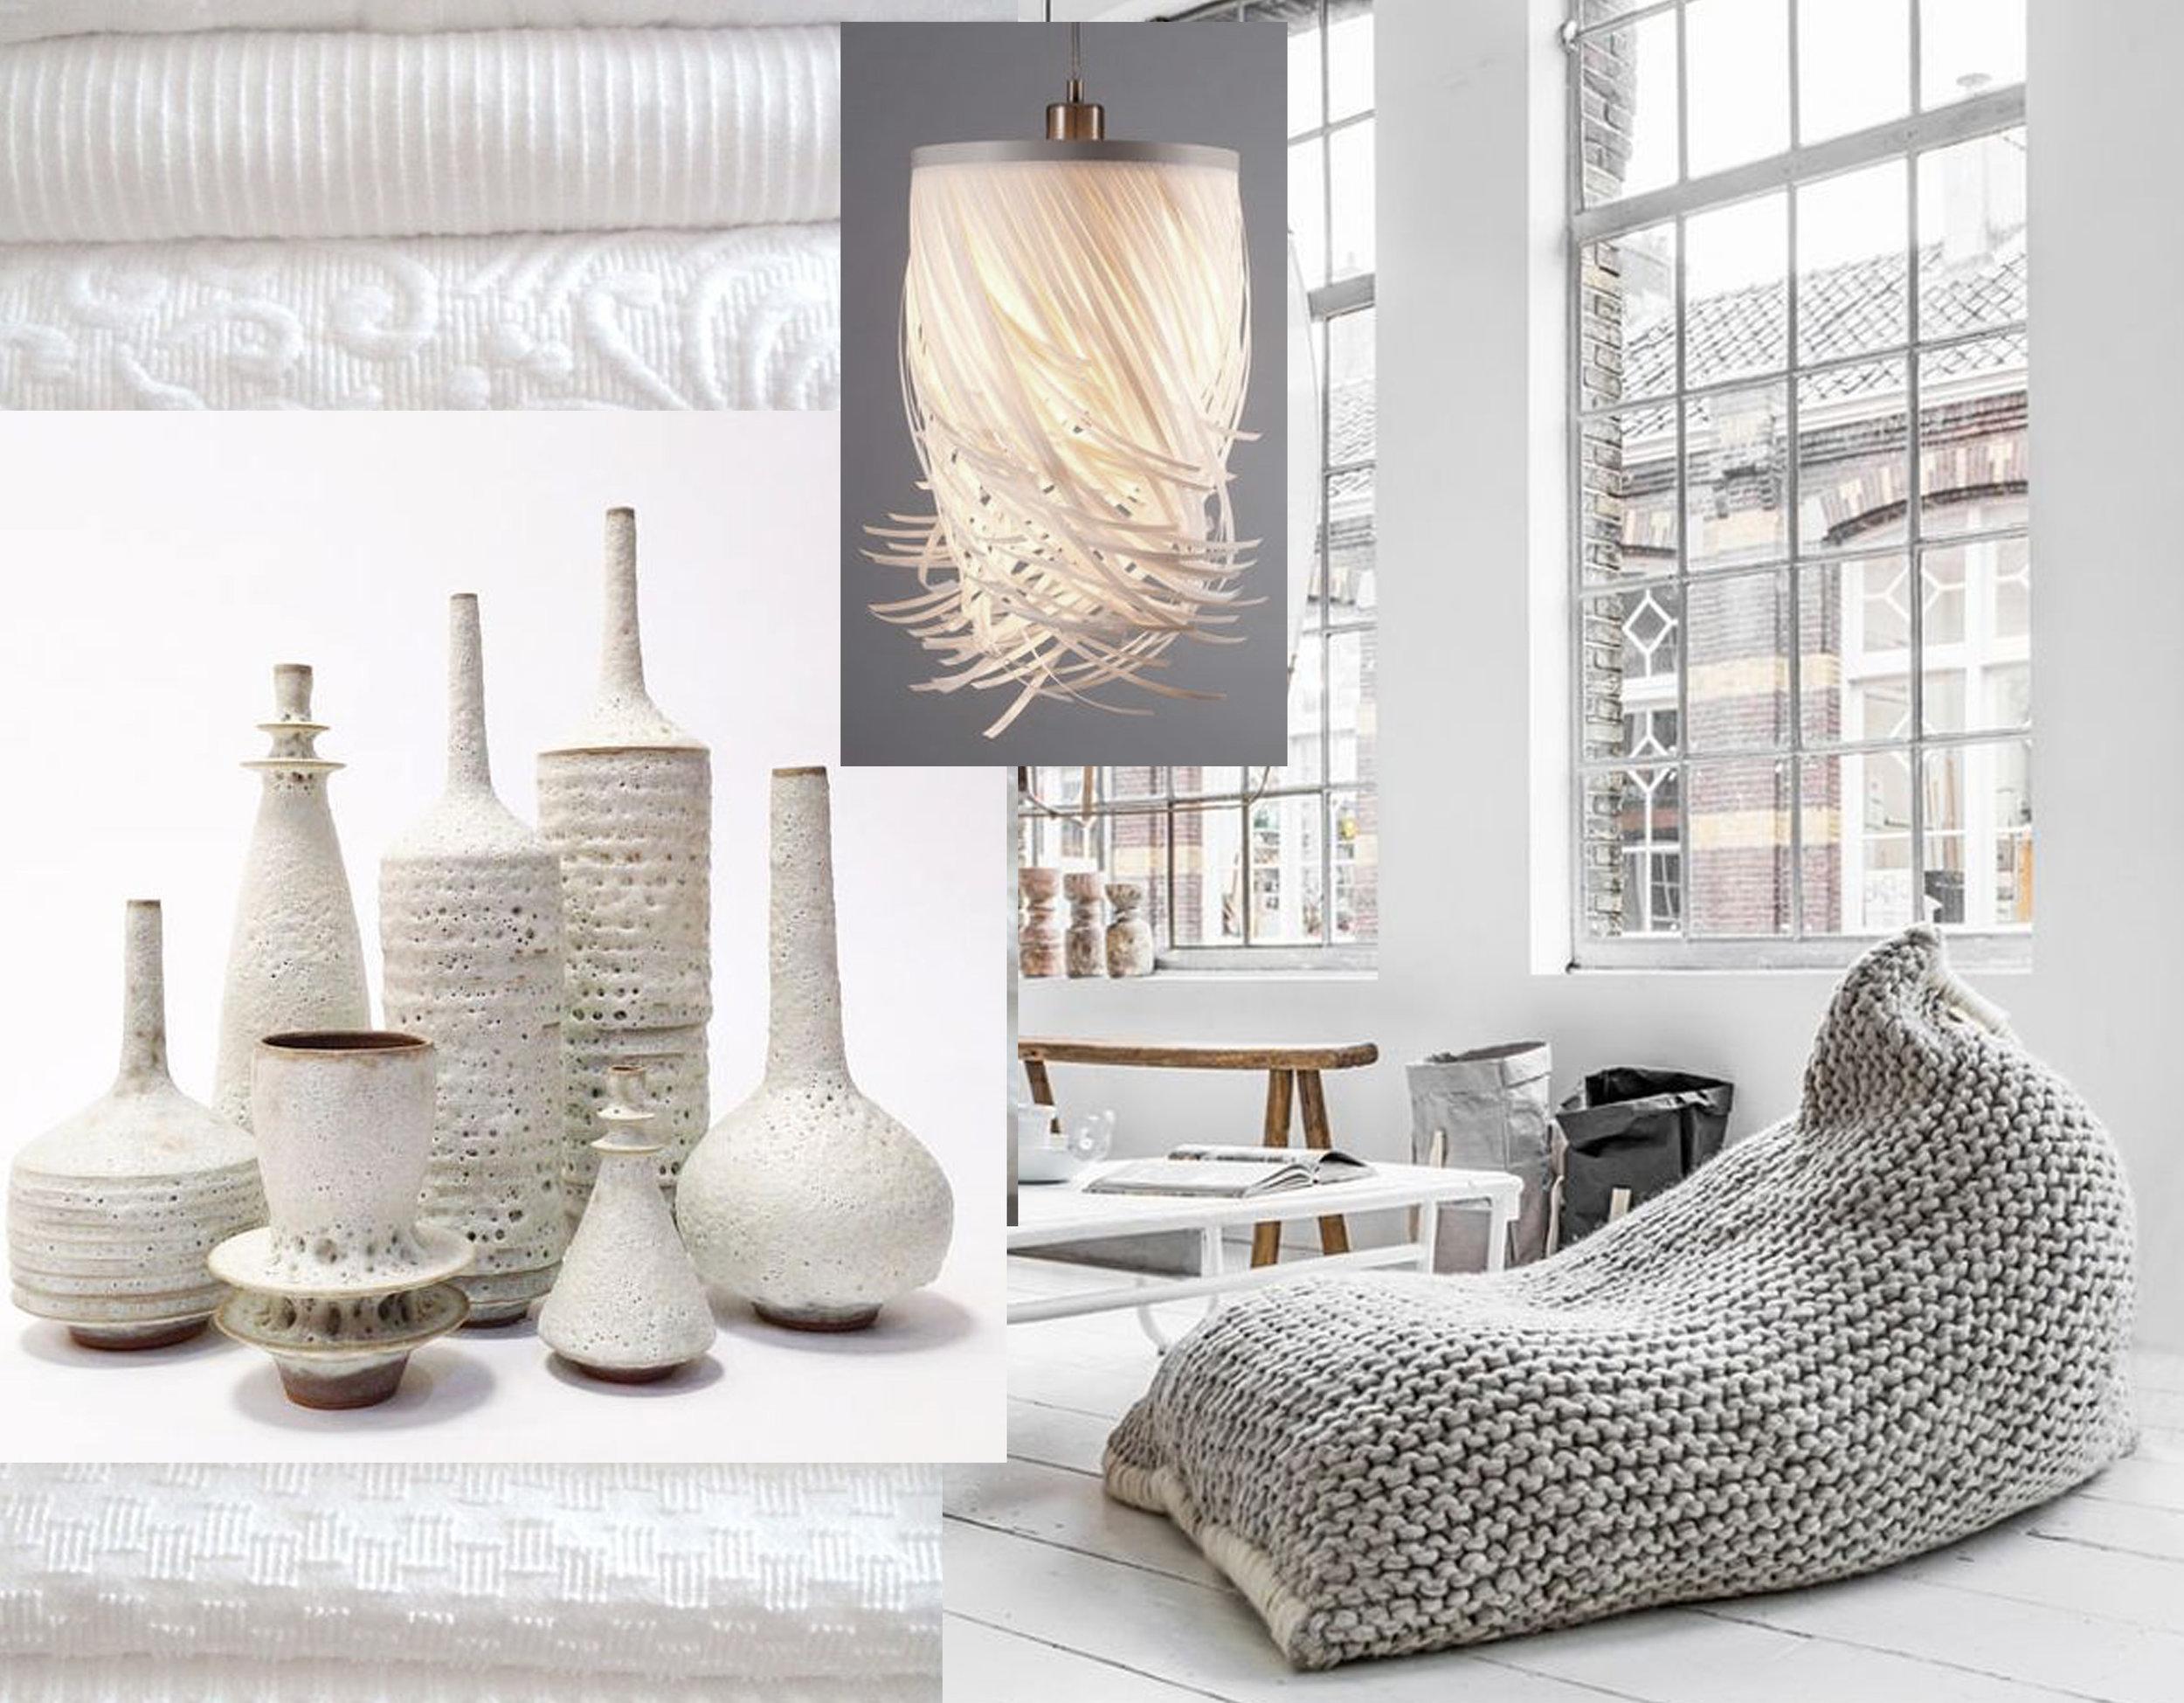 fabrics via  Cabin & Cottage  - hanging lamp Capellone  Ela Dany  - ceramics  Sara Paloma